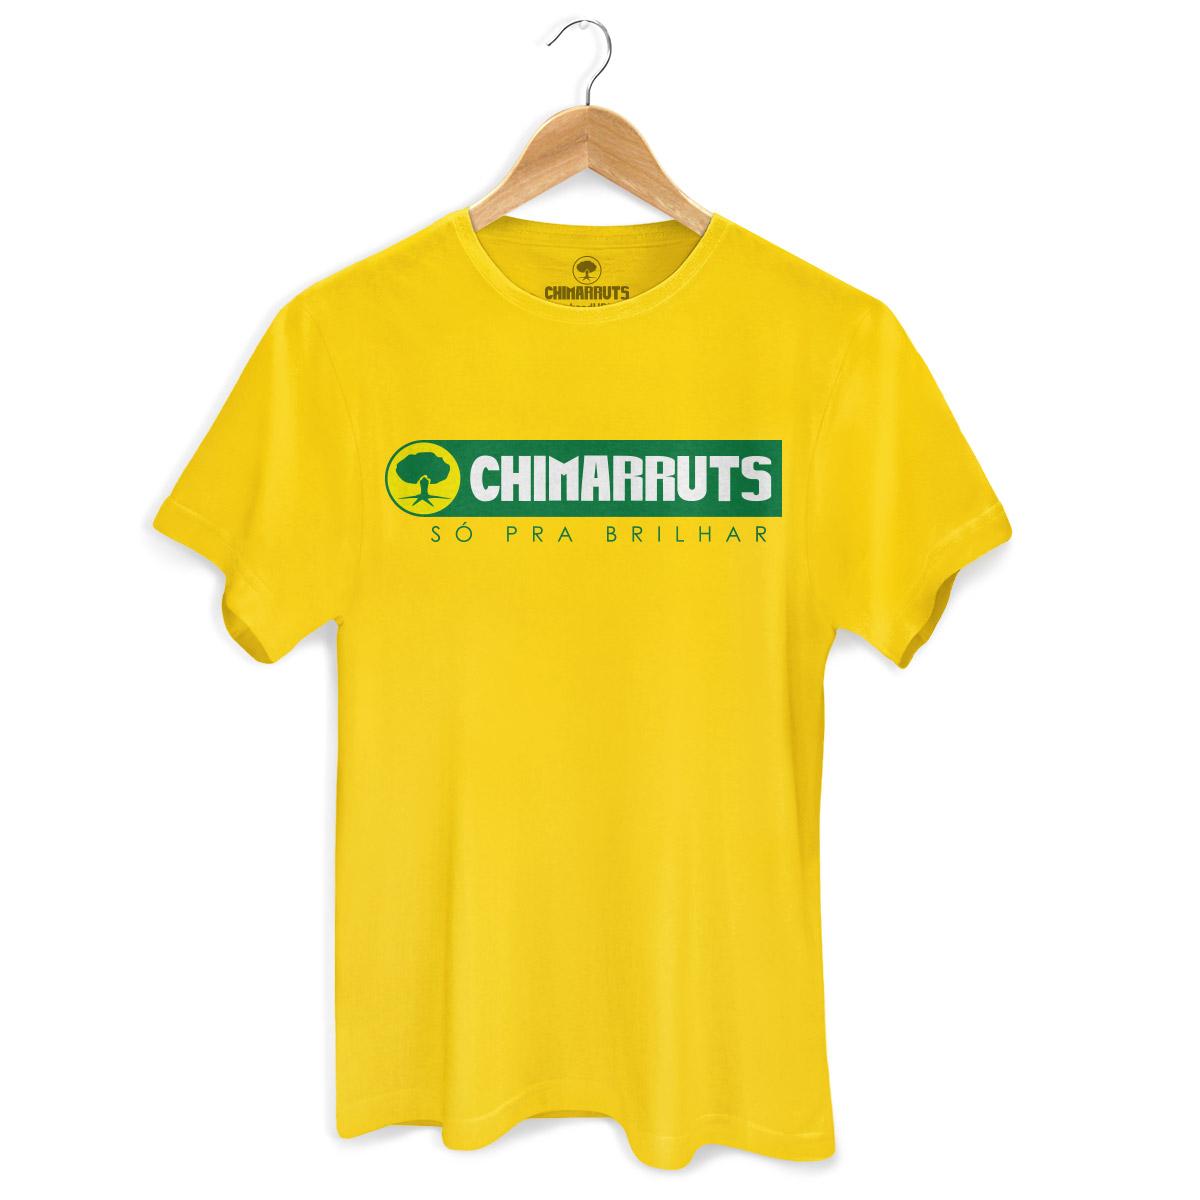 Camiseta Masculina Chimarruts Só Pra Brilhar